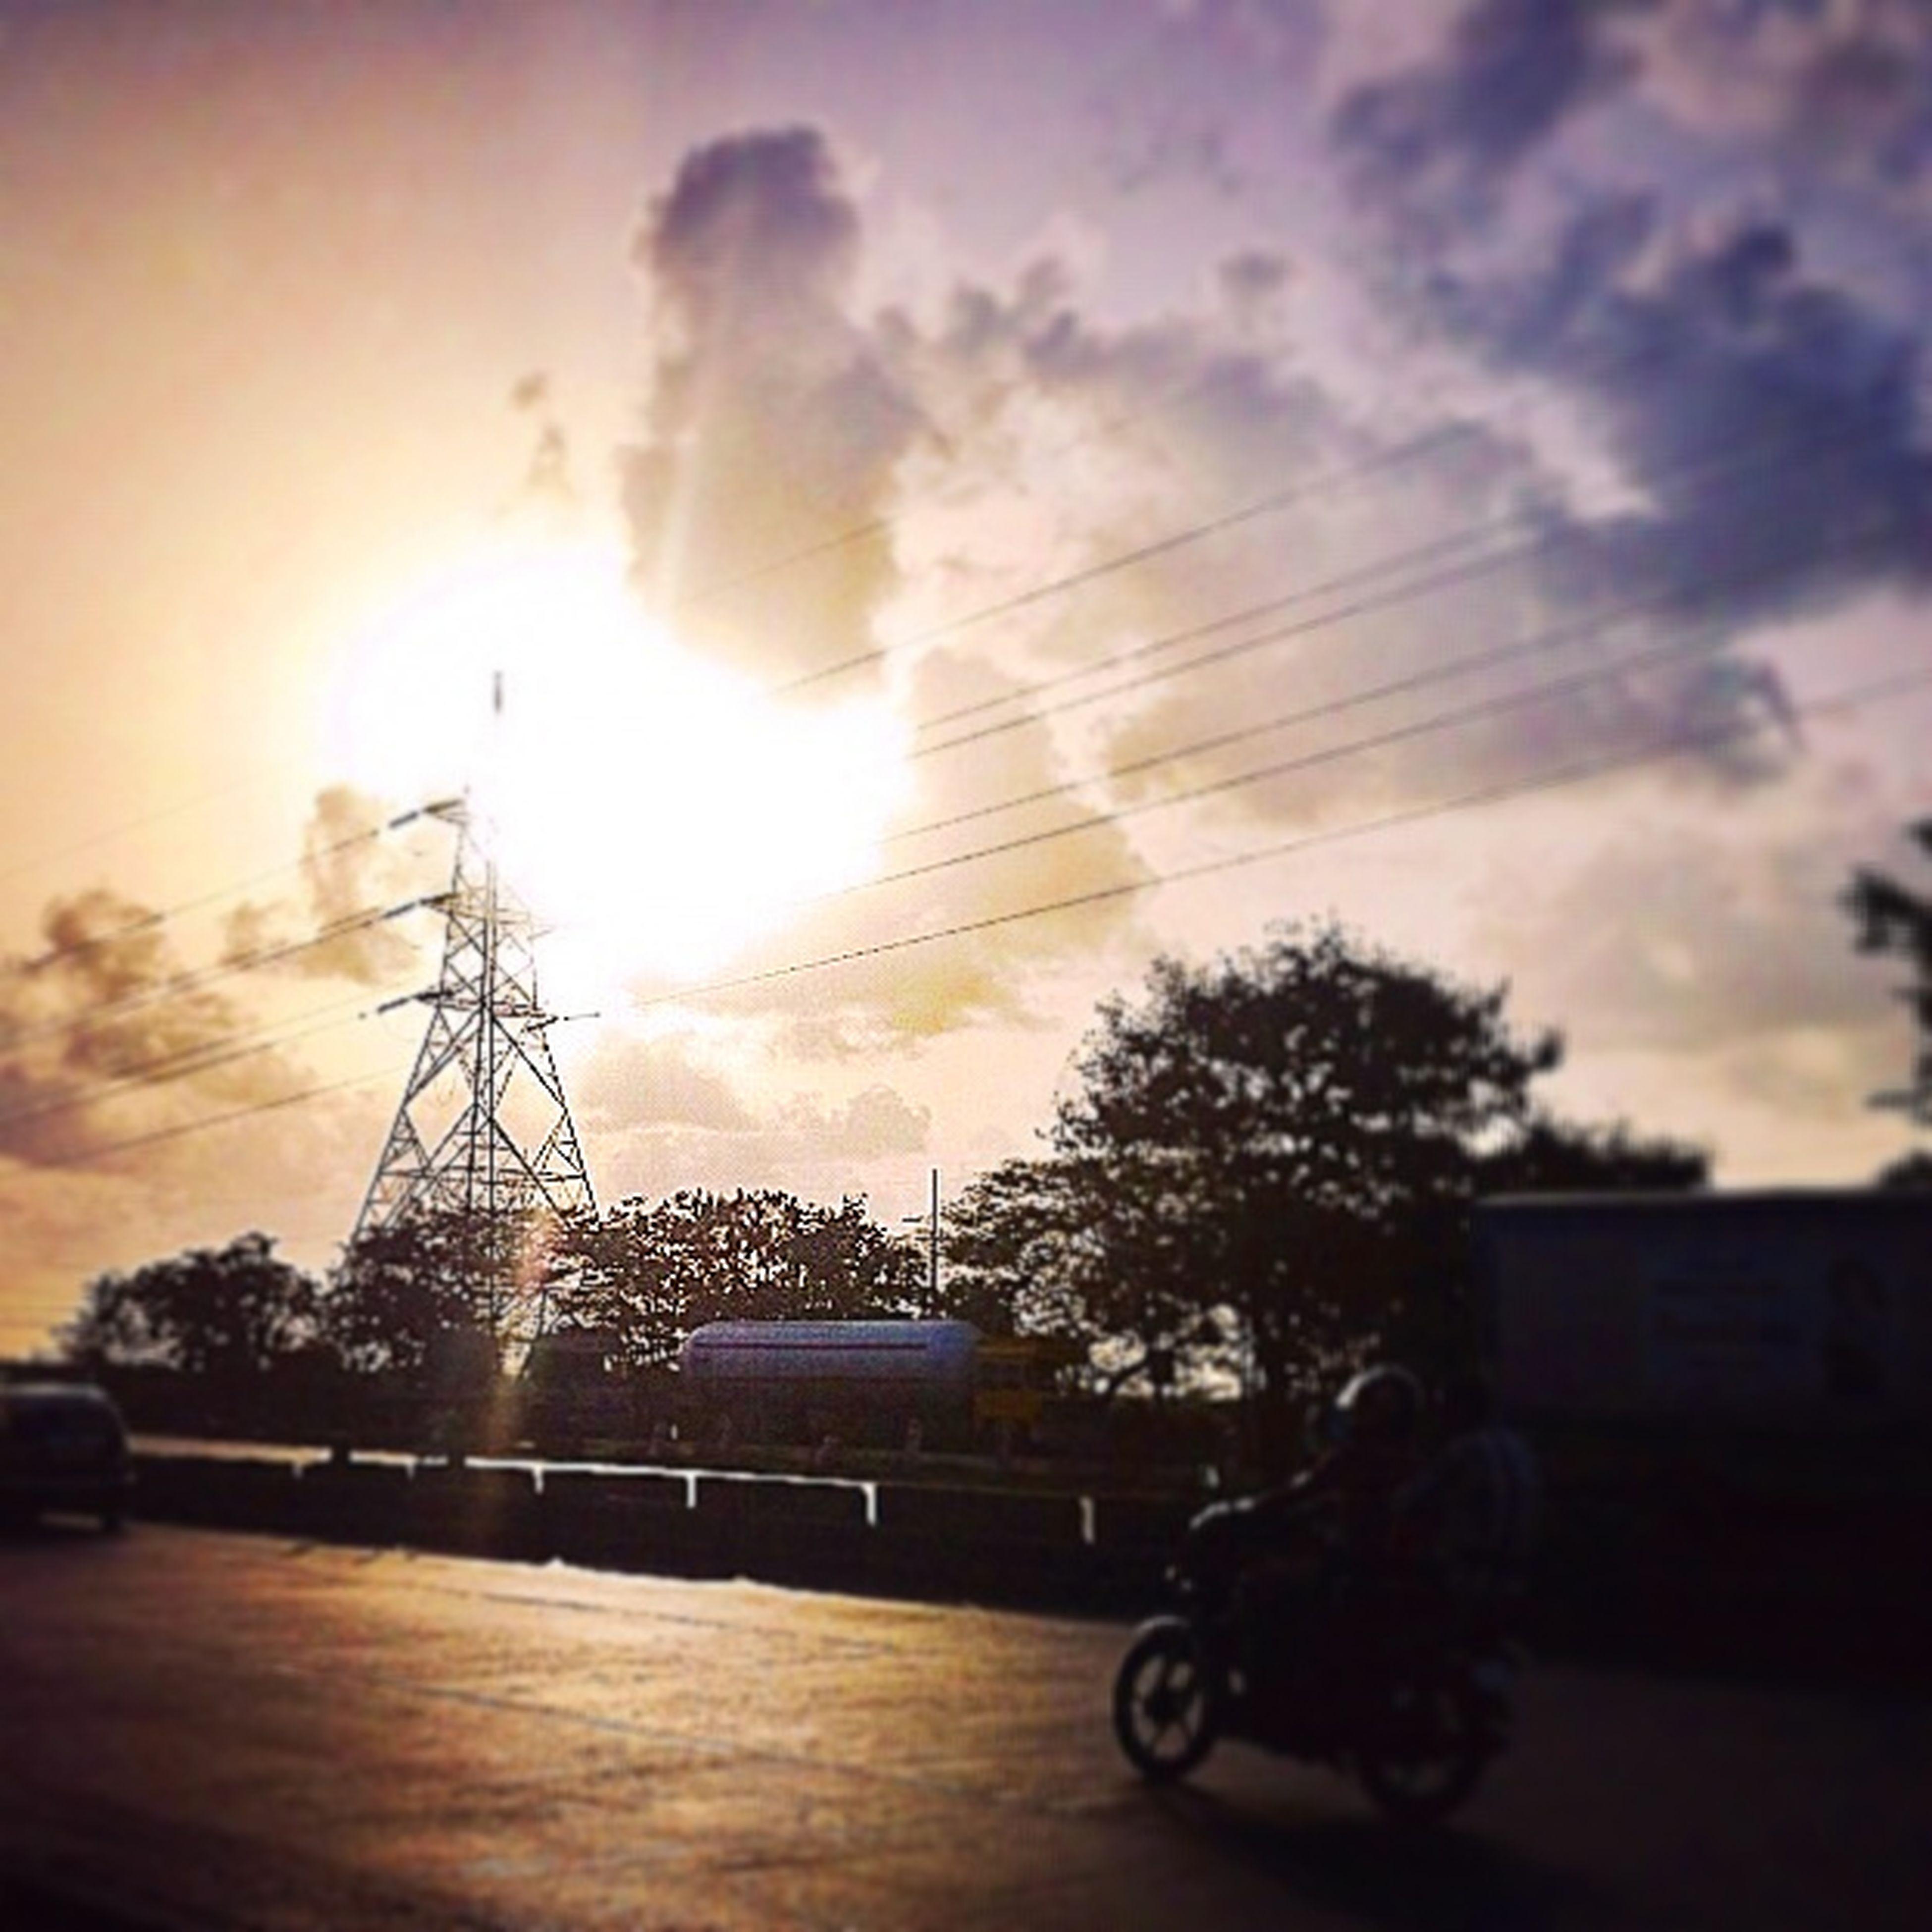 bicycle, sunset, land vehicle, transportation, sky, built structure, mode of transport, silhouette, architecture, building exterior, street, cloud - sky, sunlight, sun, city, road, orange color, outdoors, railing